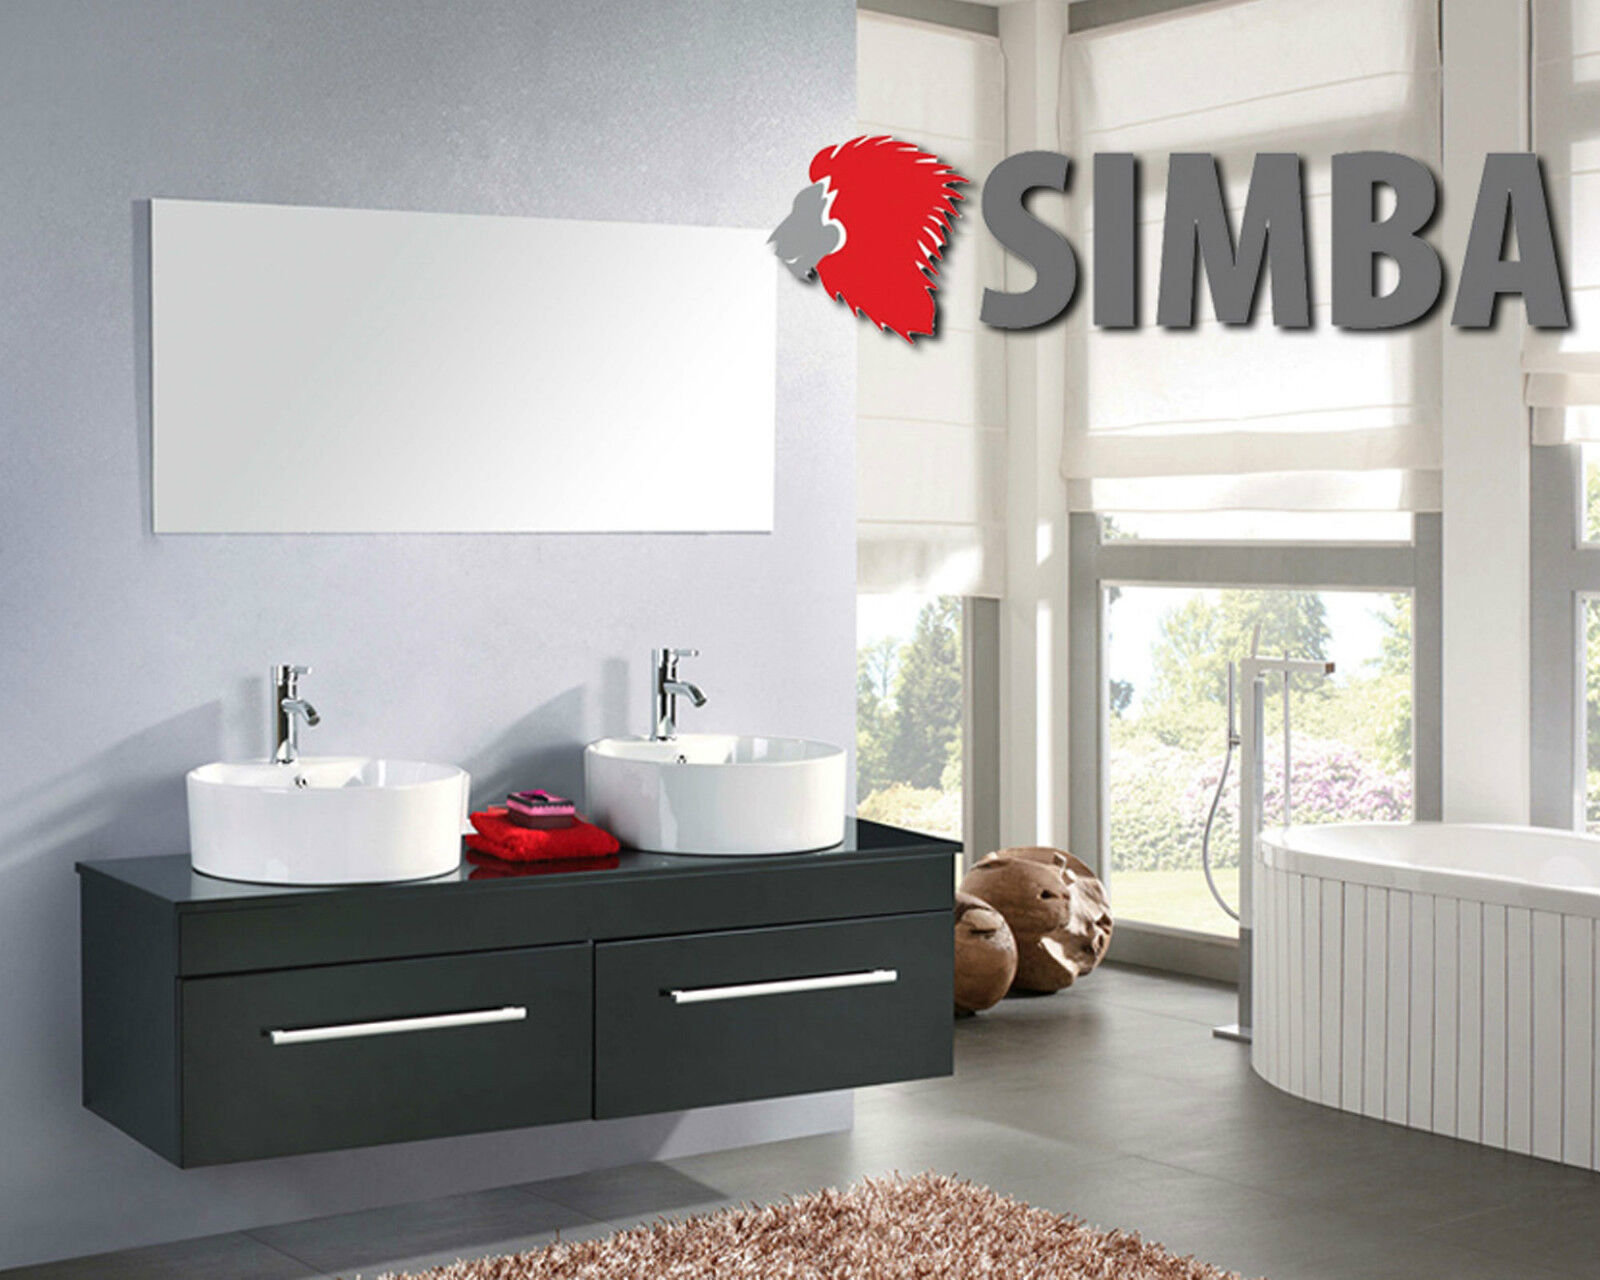 Meuble de salle de bain 150 cm double lavabo, salle de bains meubles, miroir, Robinets incl, CARDEL